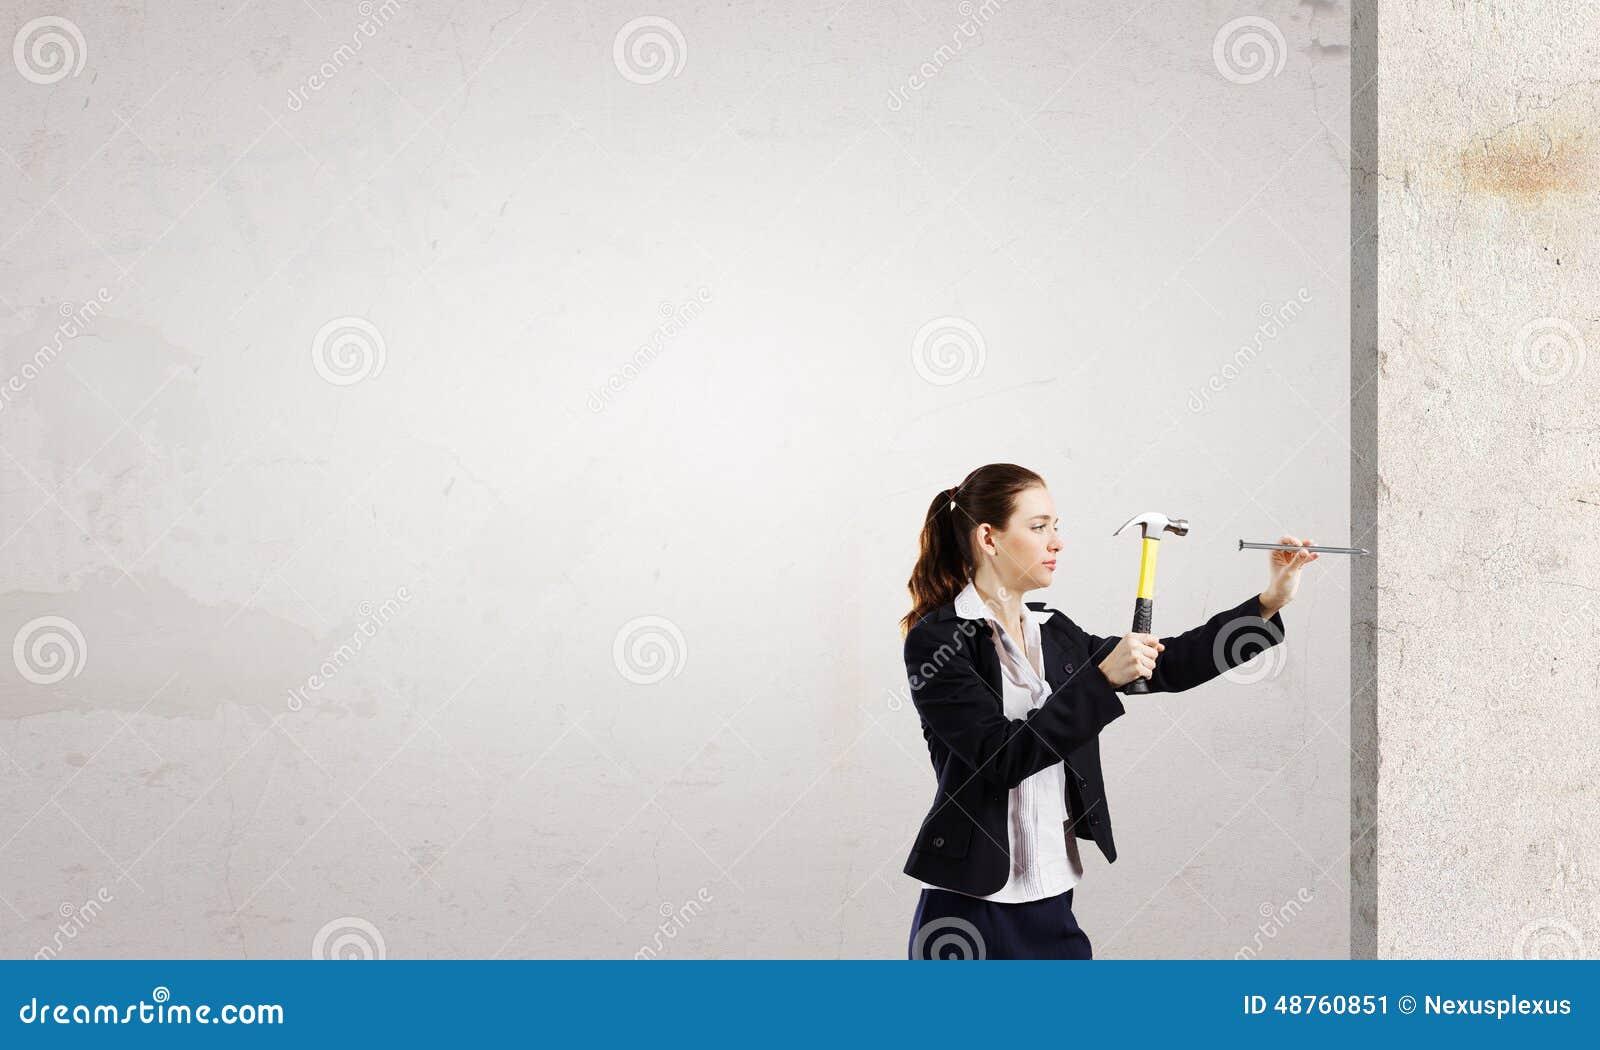 womens hammer